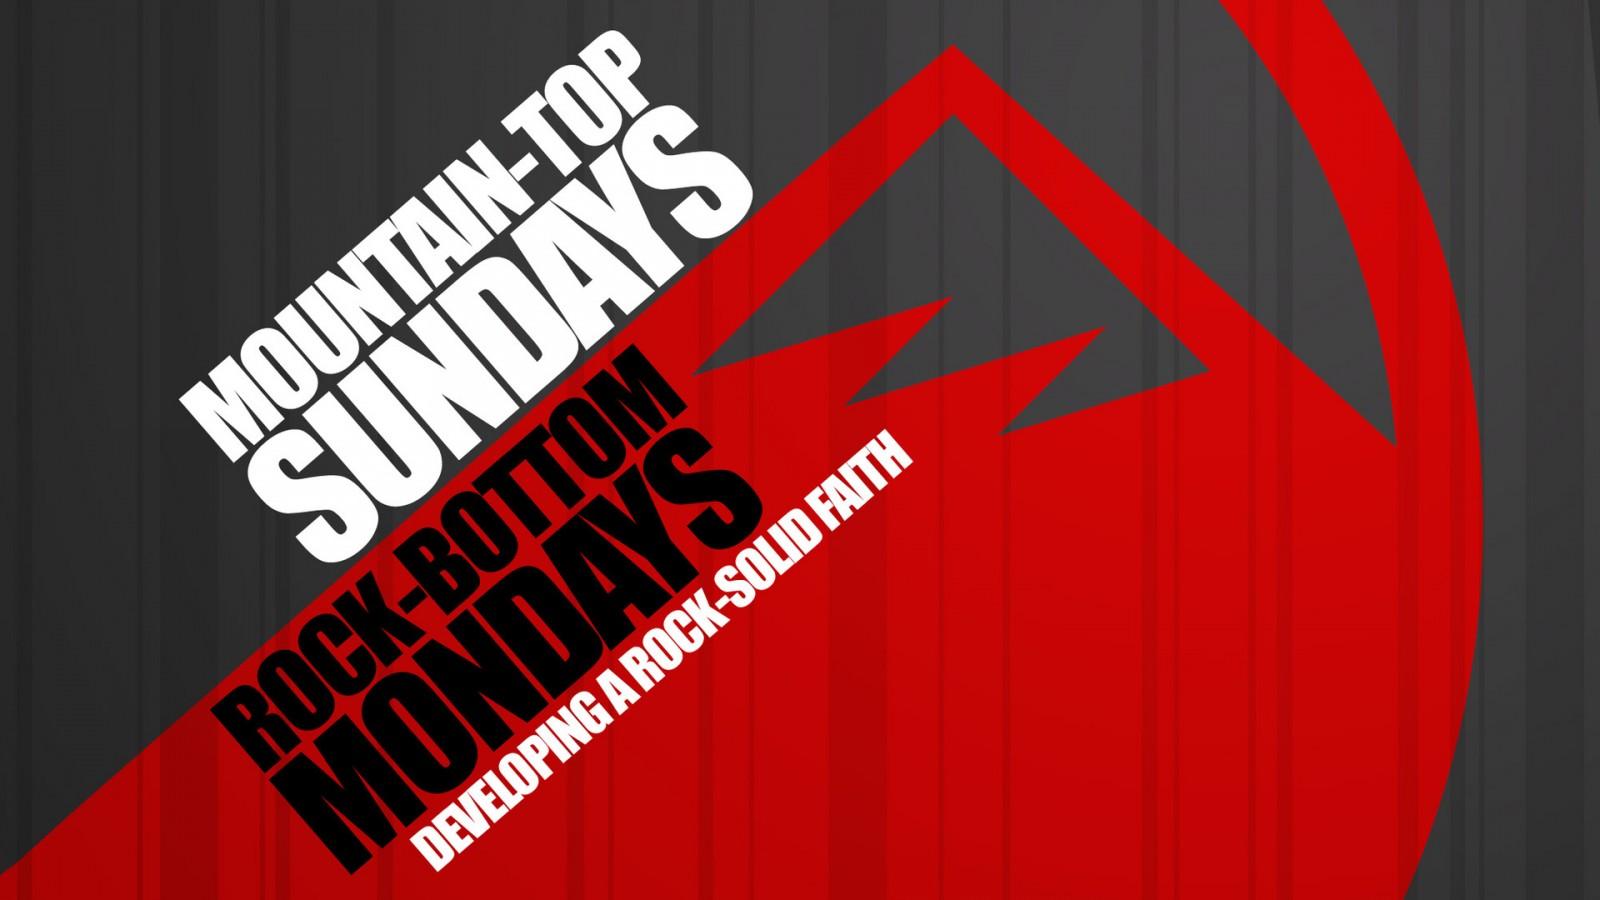 mountaintop_sundays_rock_bottom_mondays-title-1-Wide 16x9